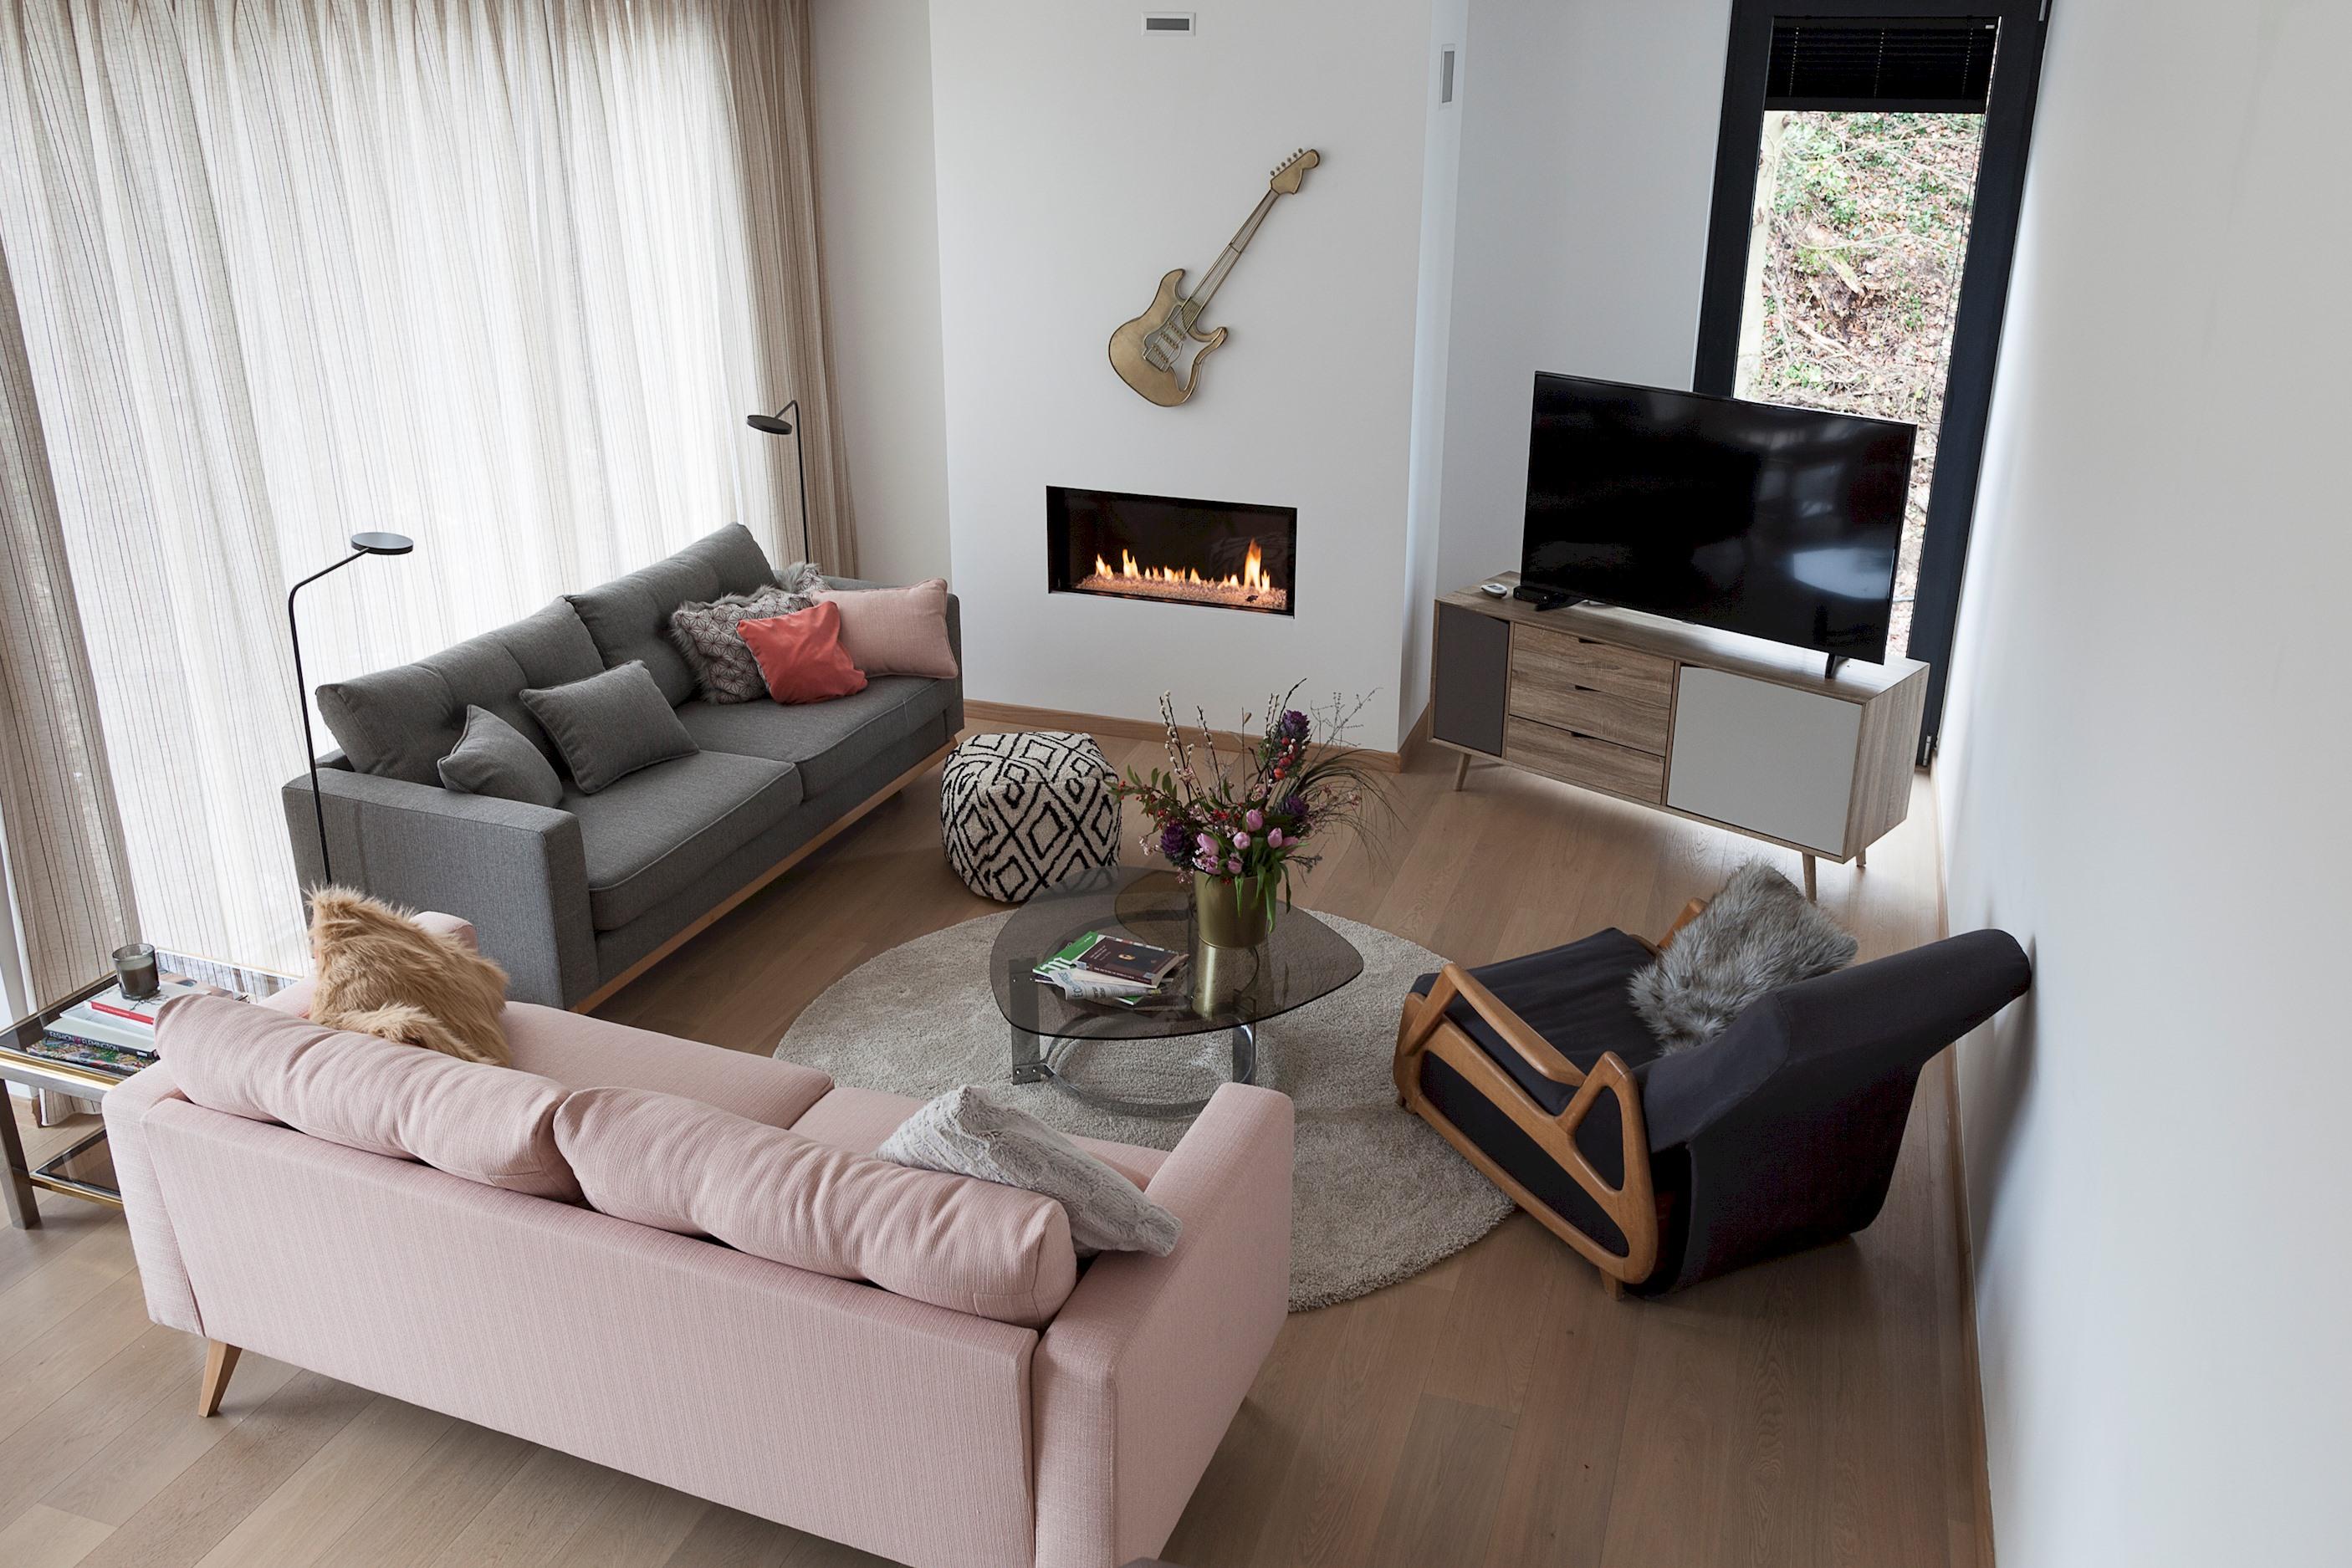 Unit 2 - Modern Smart Home Duplex with free Parking 1